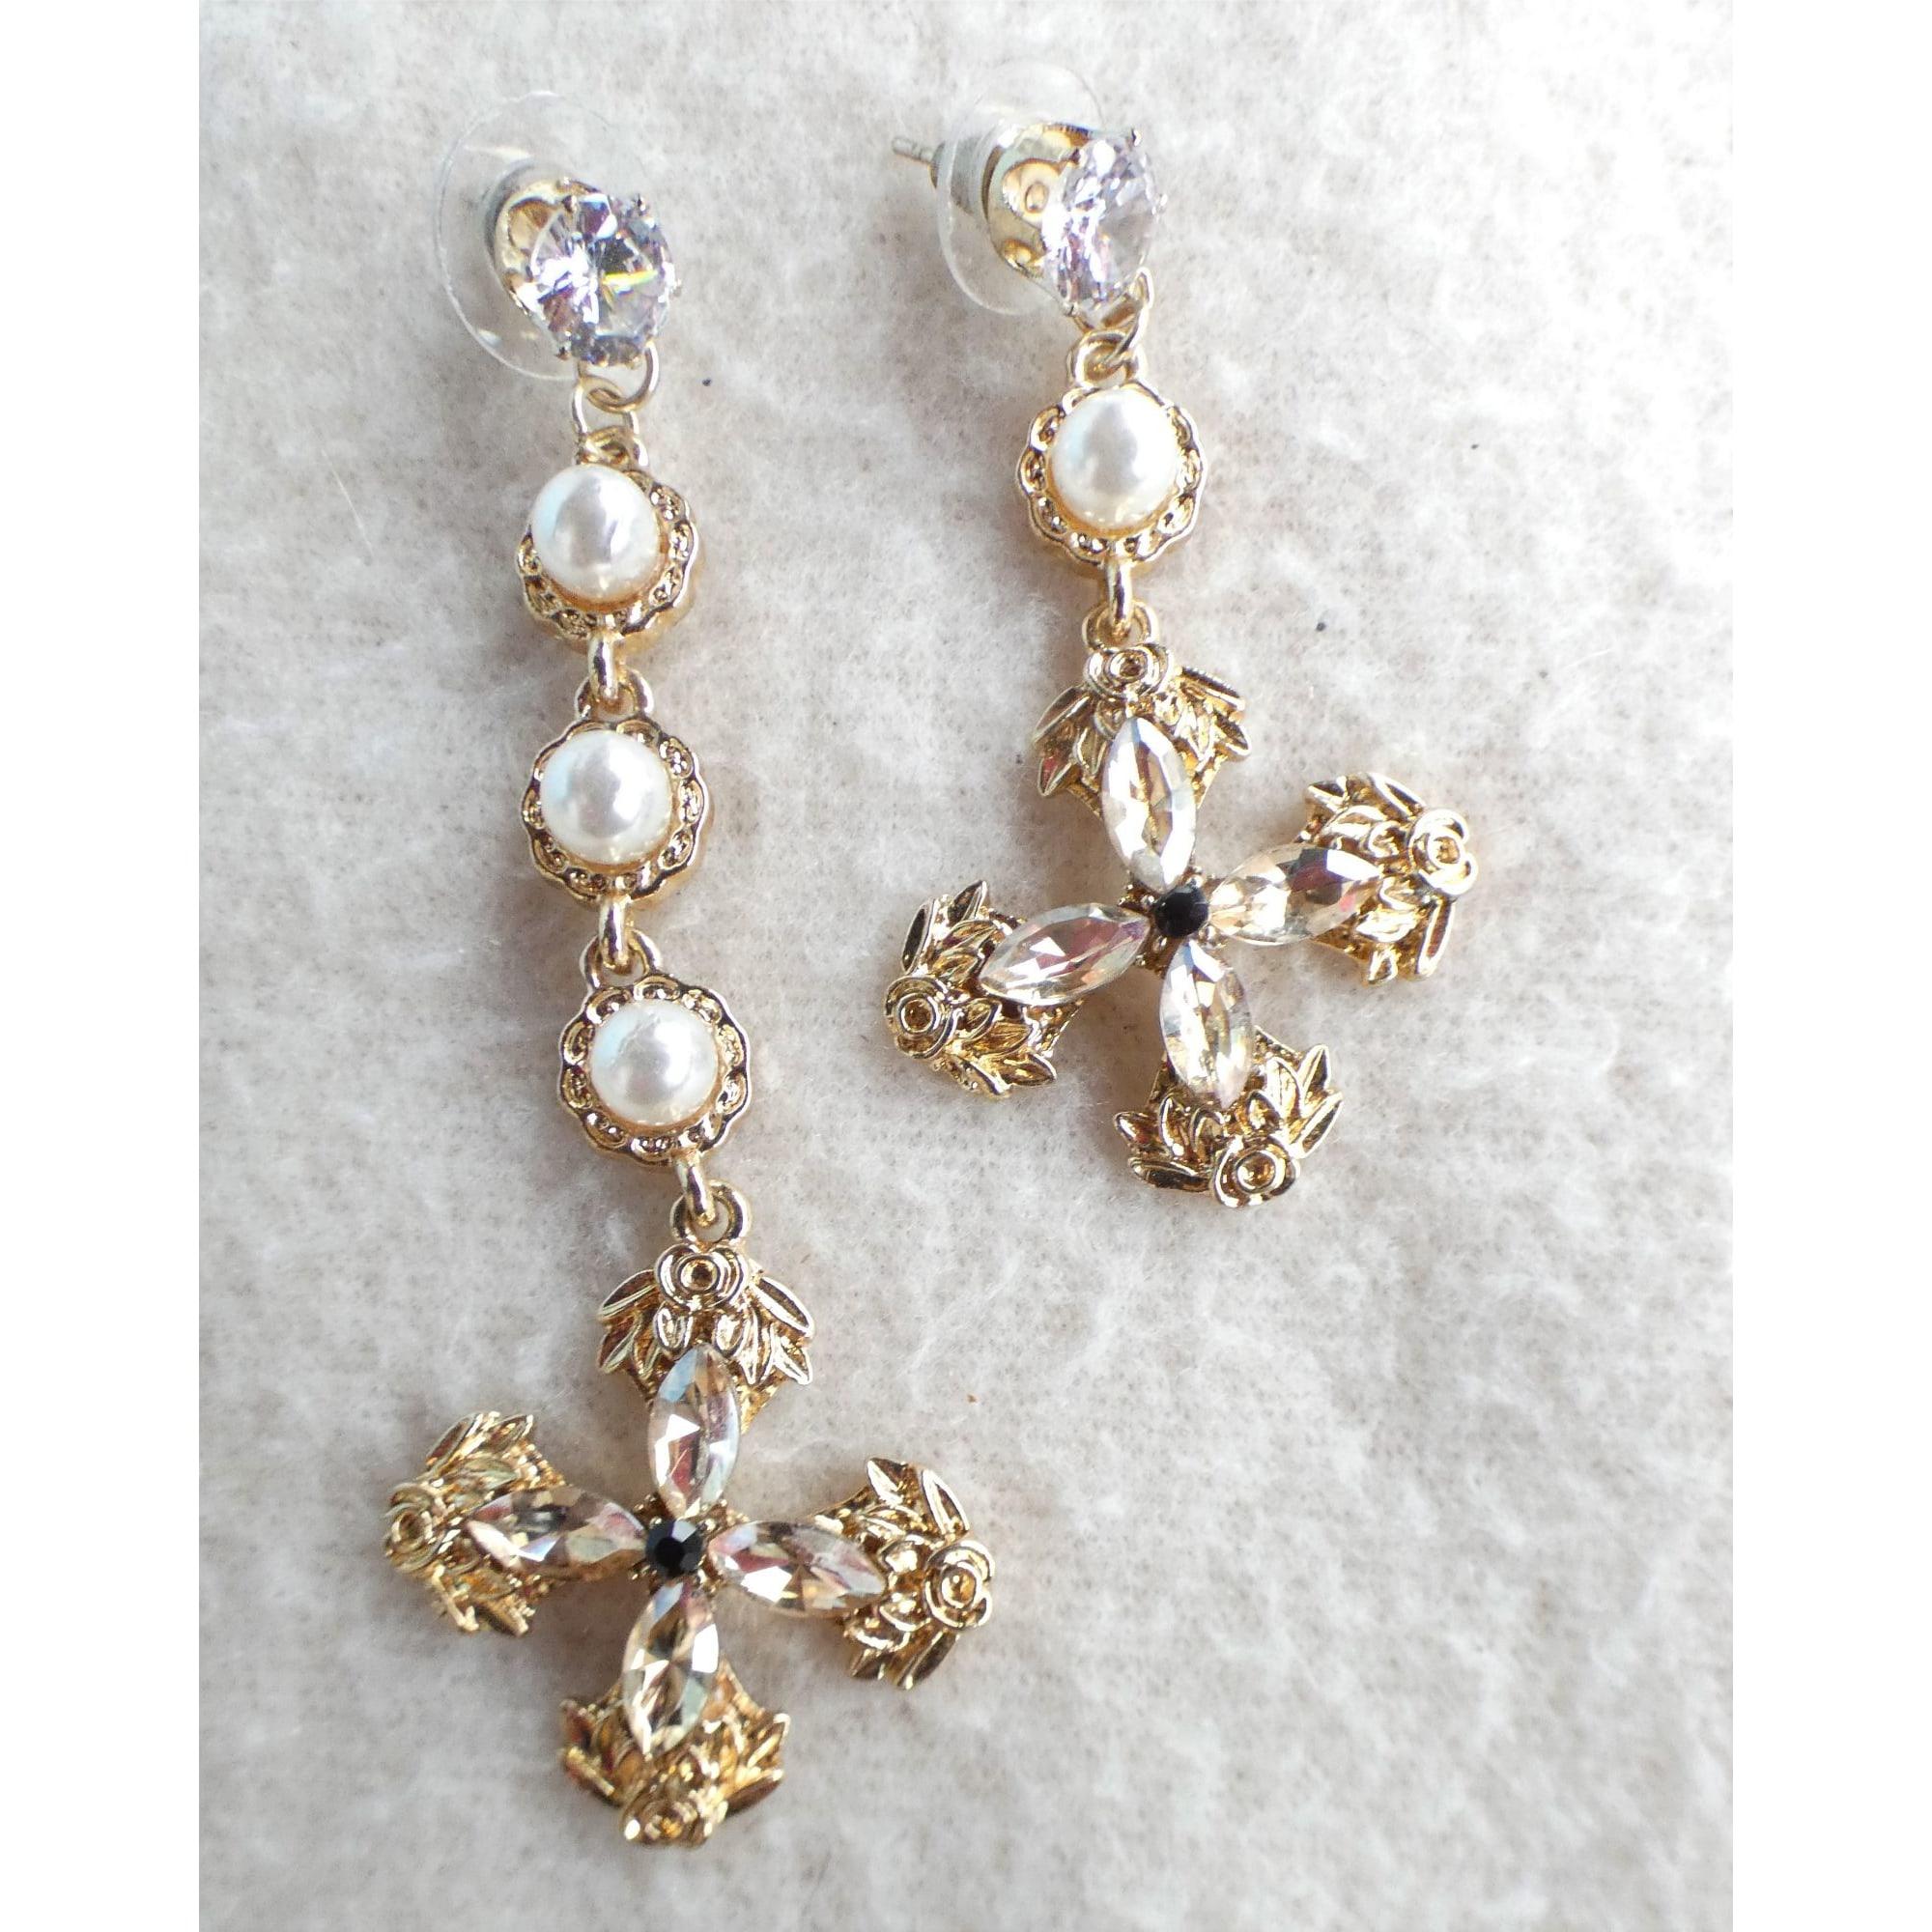 Boucles d'oreille FANTAISIE strass et perles